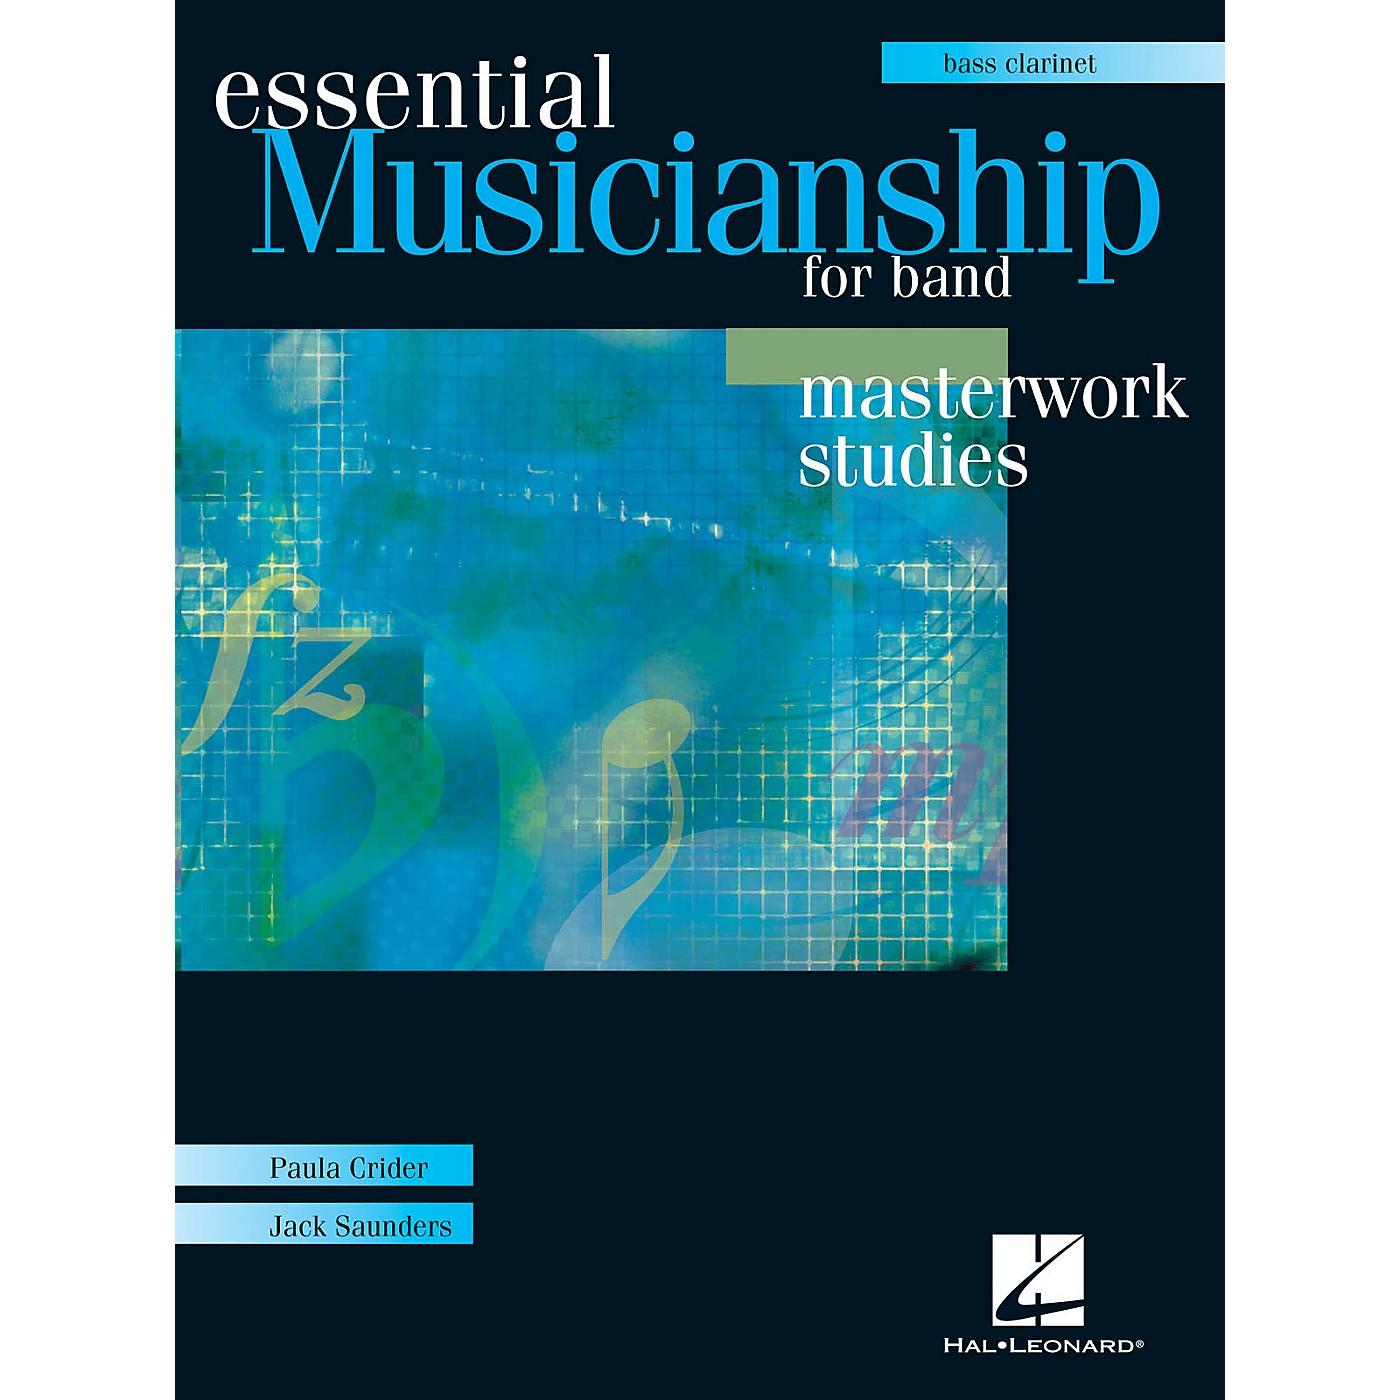 Hal Leonard Essential Musicianship for Band - Masterwork Studies (Bass Clarinet) Concert Band thumbnail